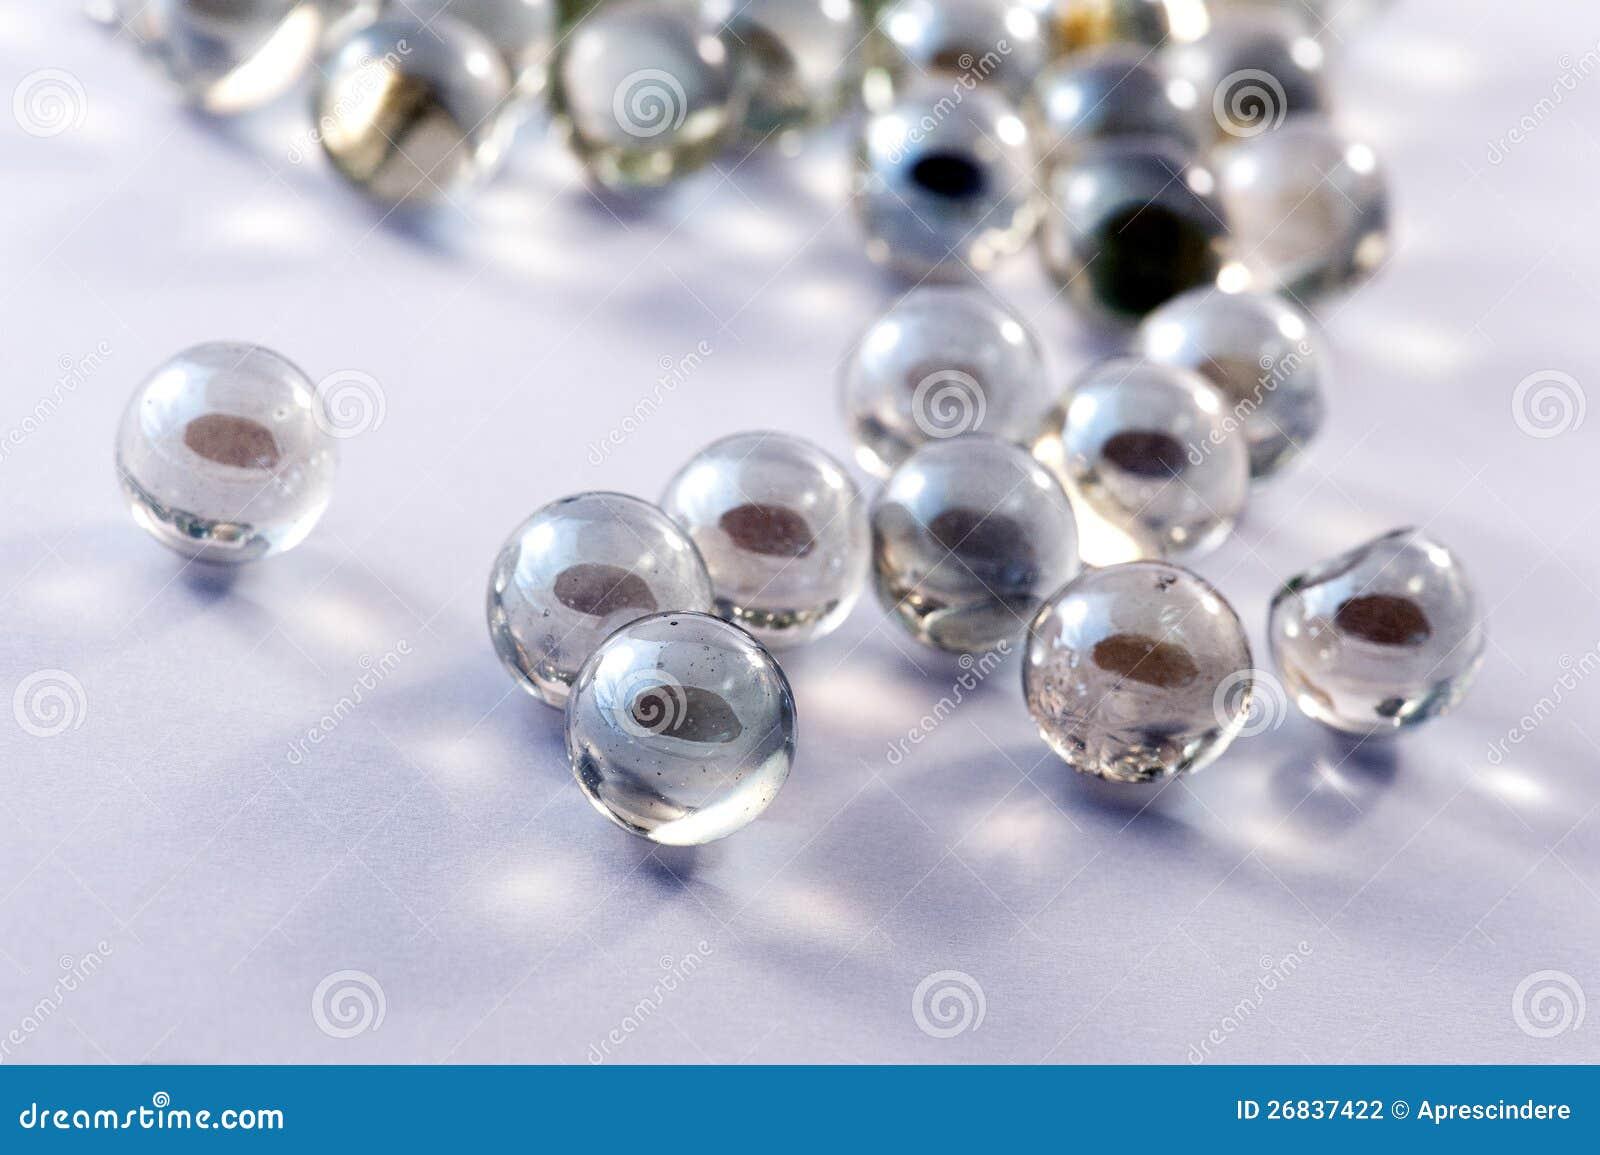 Glass marbles balls